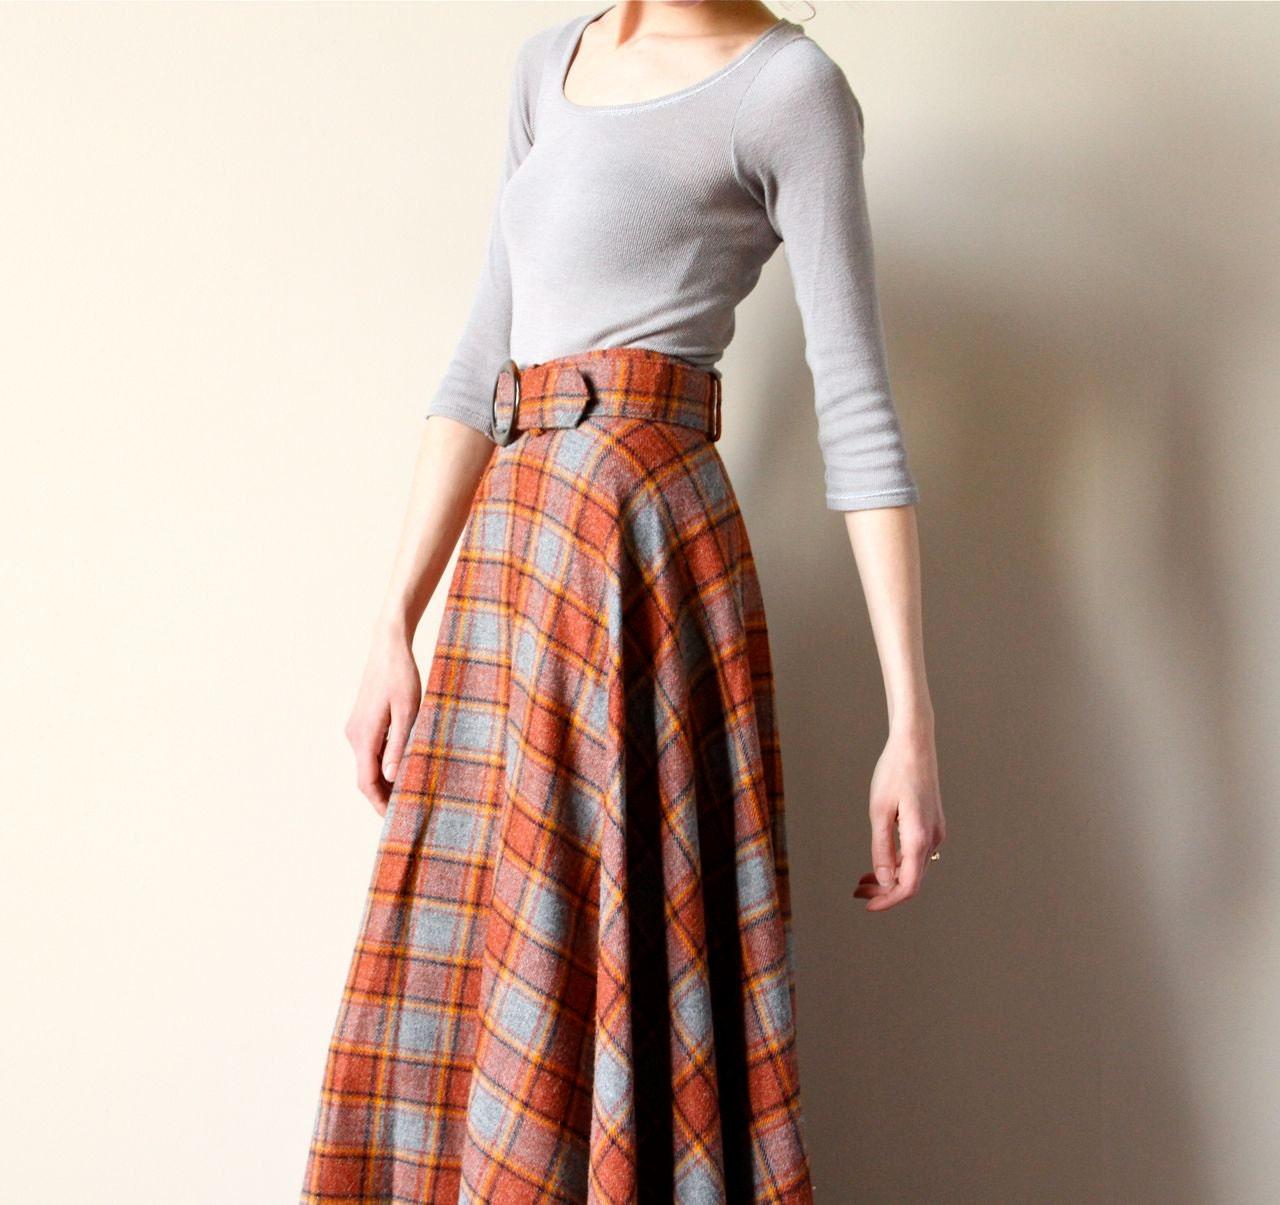 60s Plaid Wool Maxi Skirt Boho Hippie Tartan Long A Line